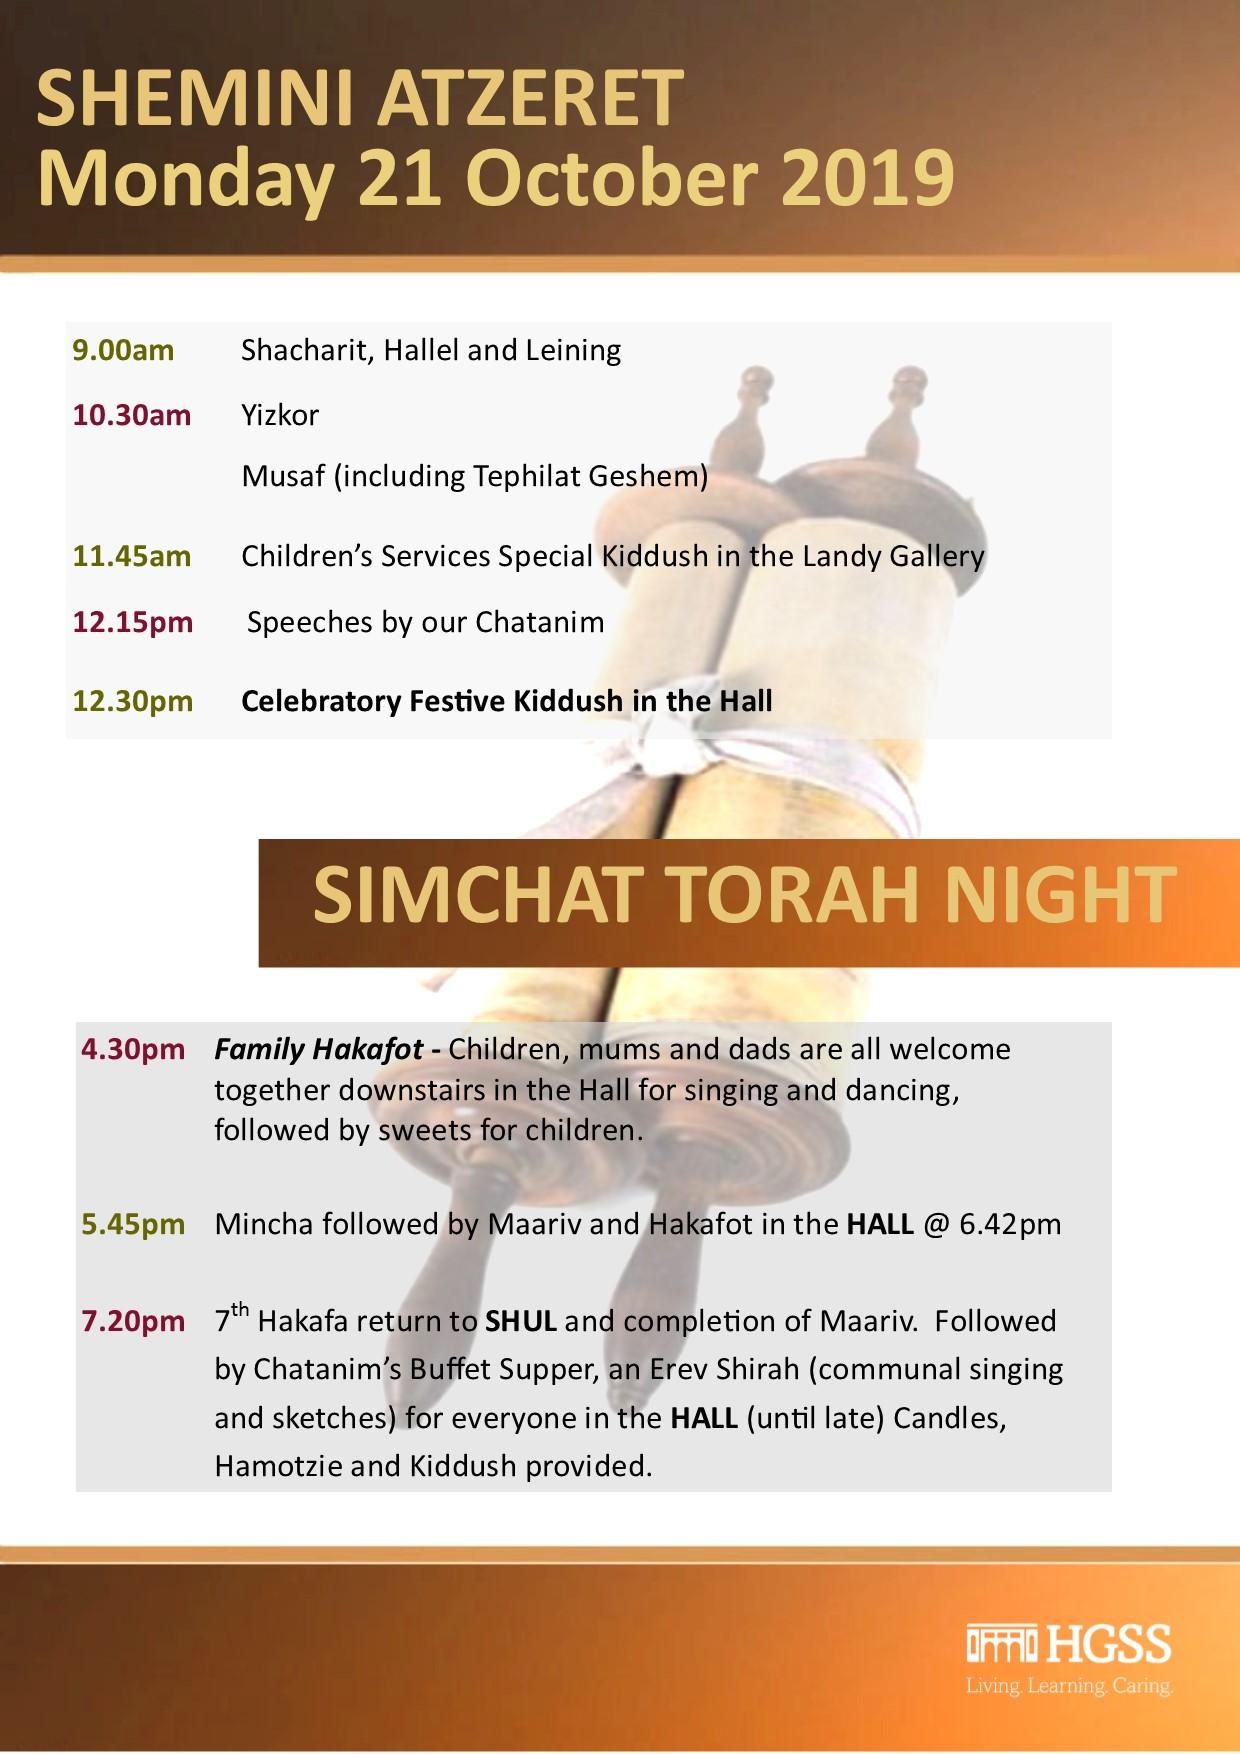 Shemini Atzeret @ Jewish Holidays